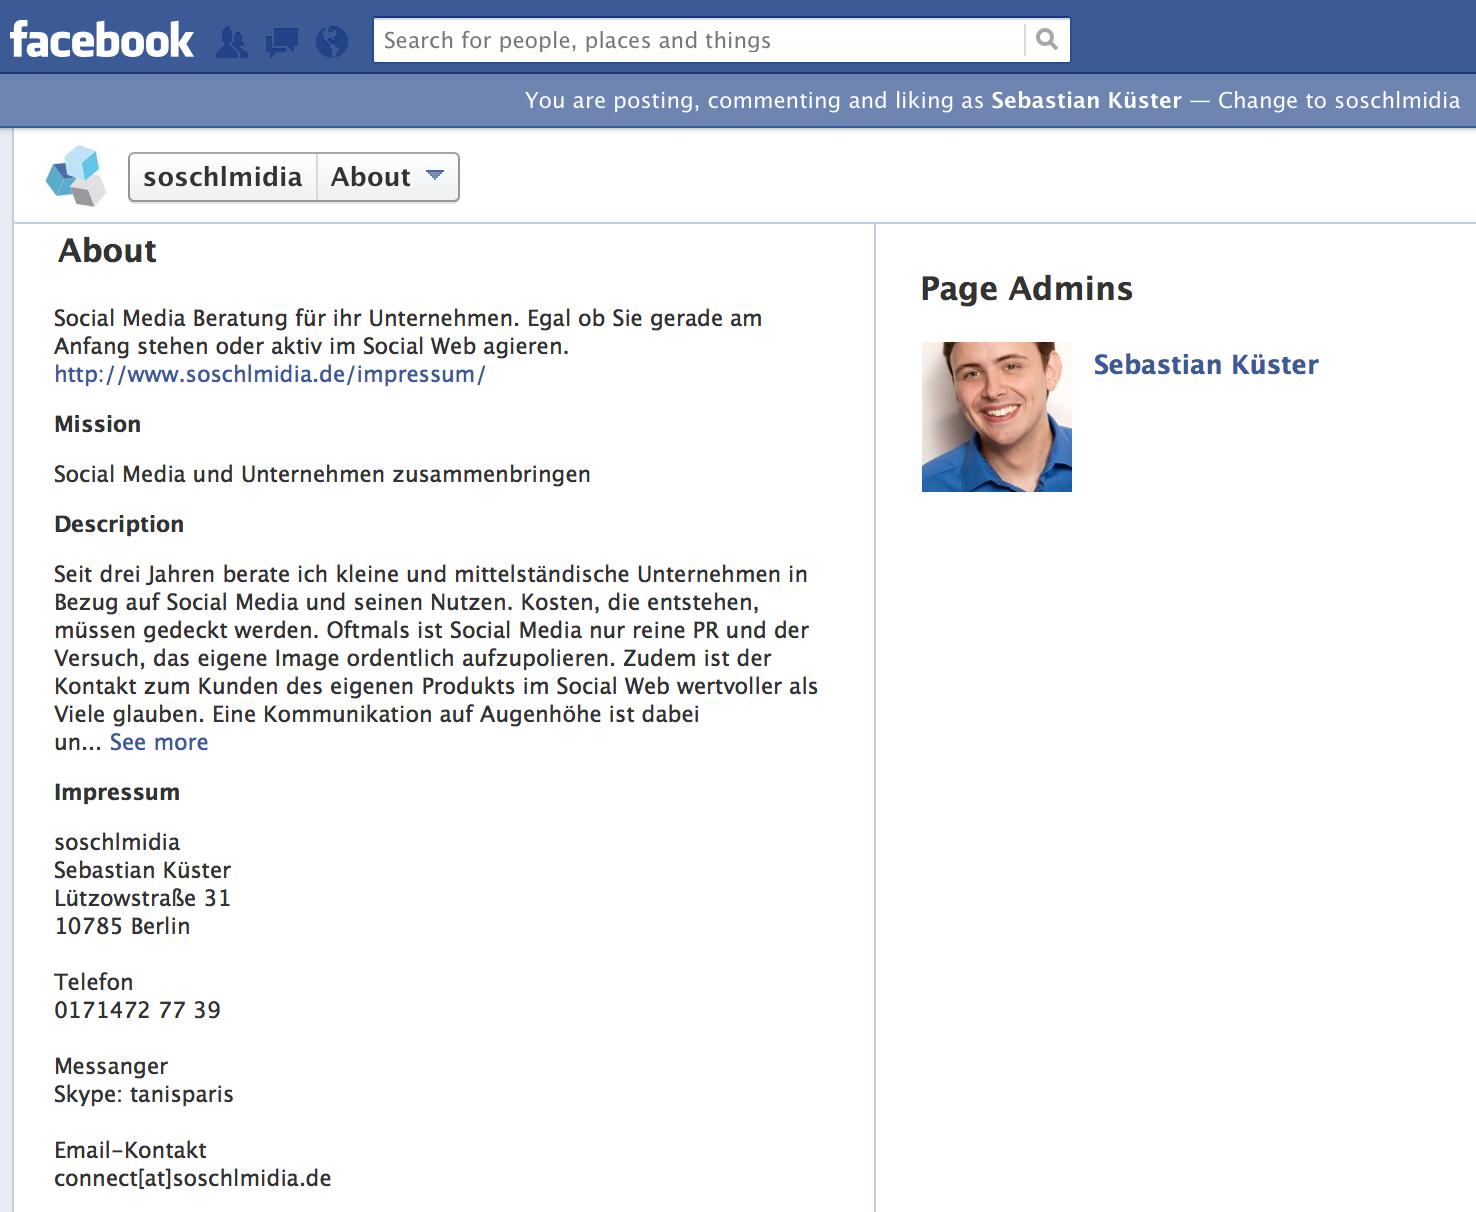 facebook-impressum-soschlmidia